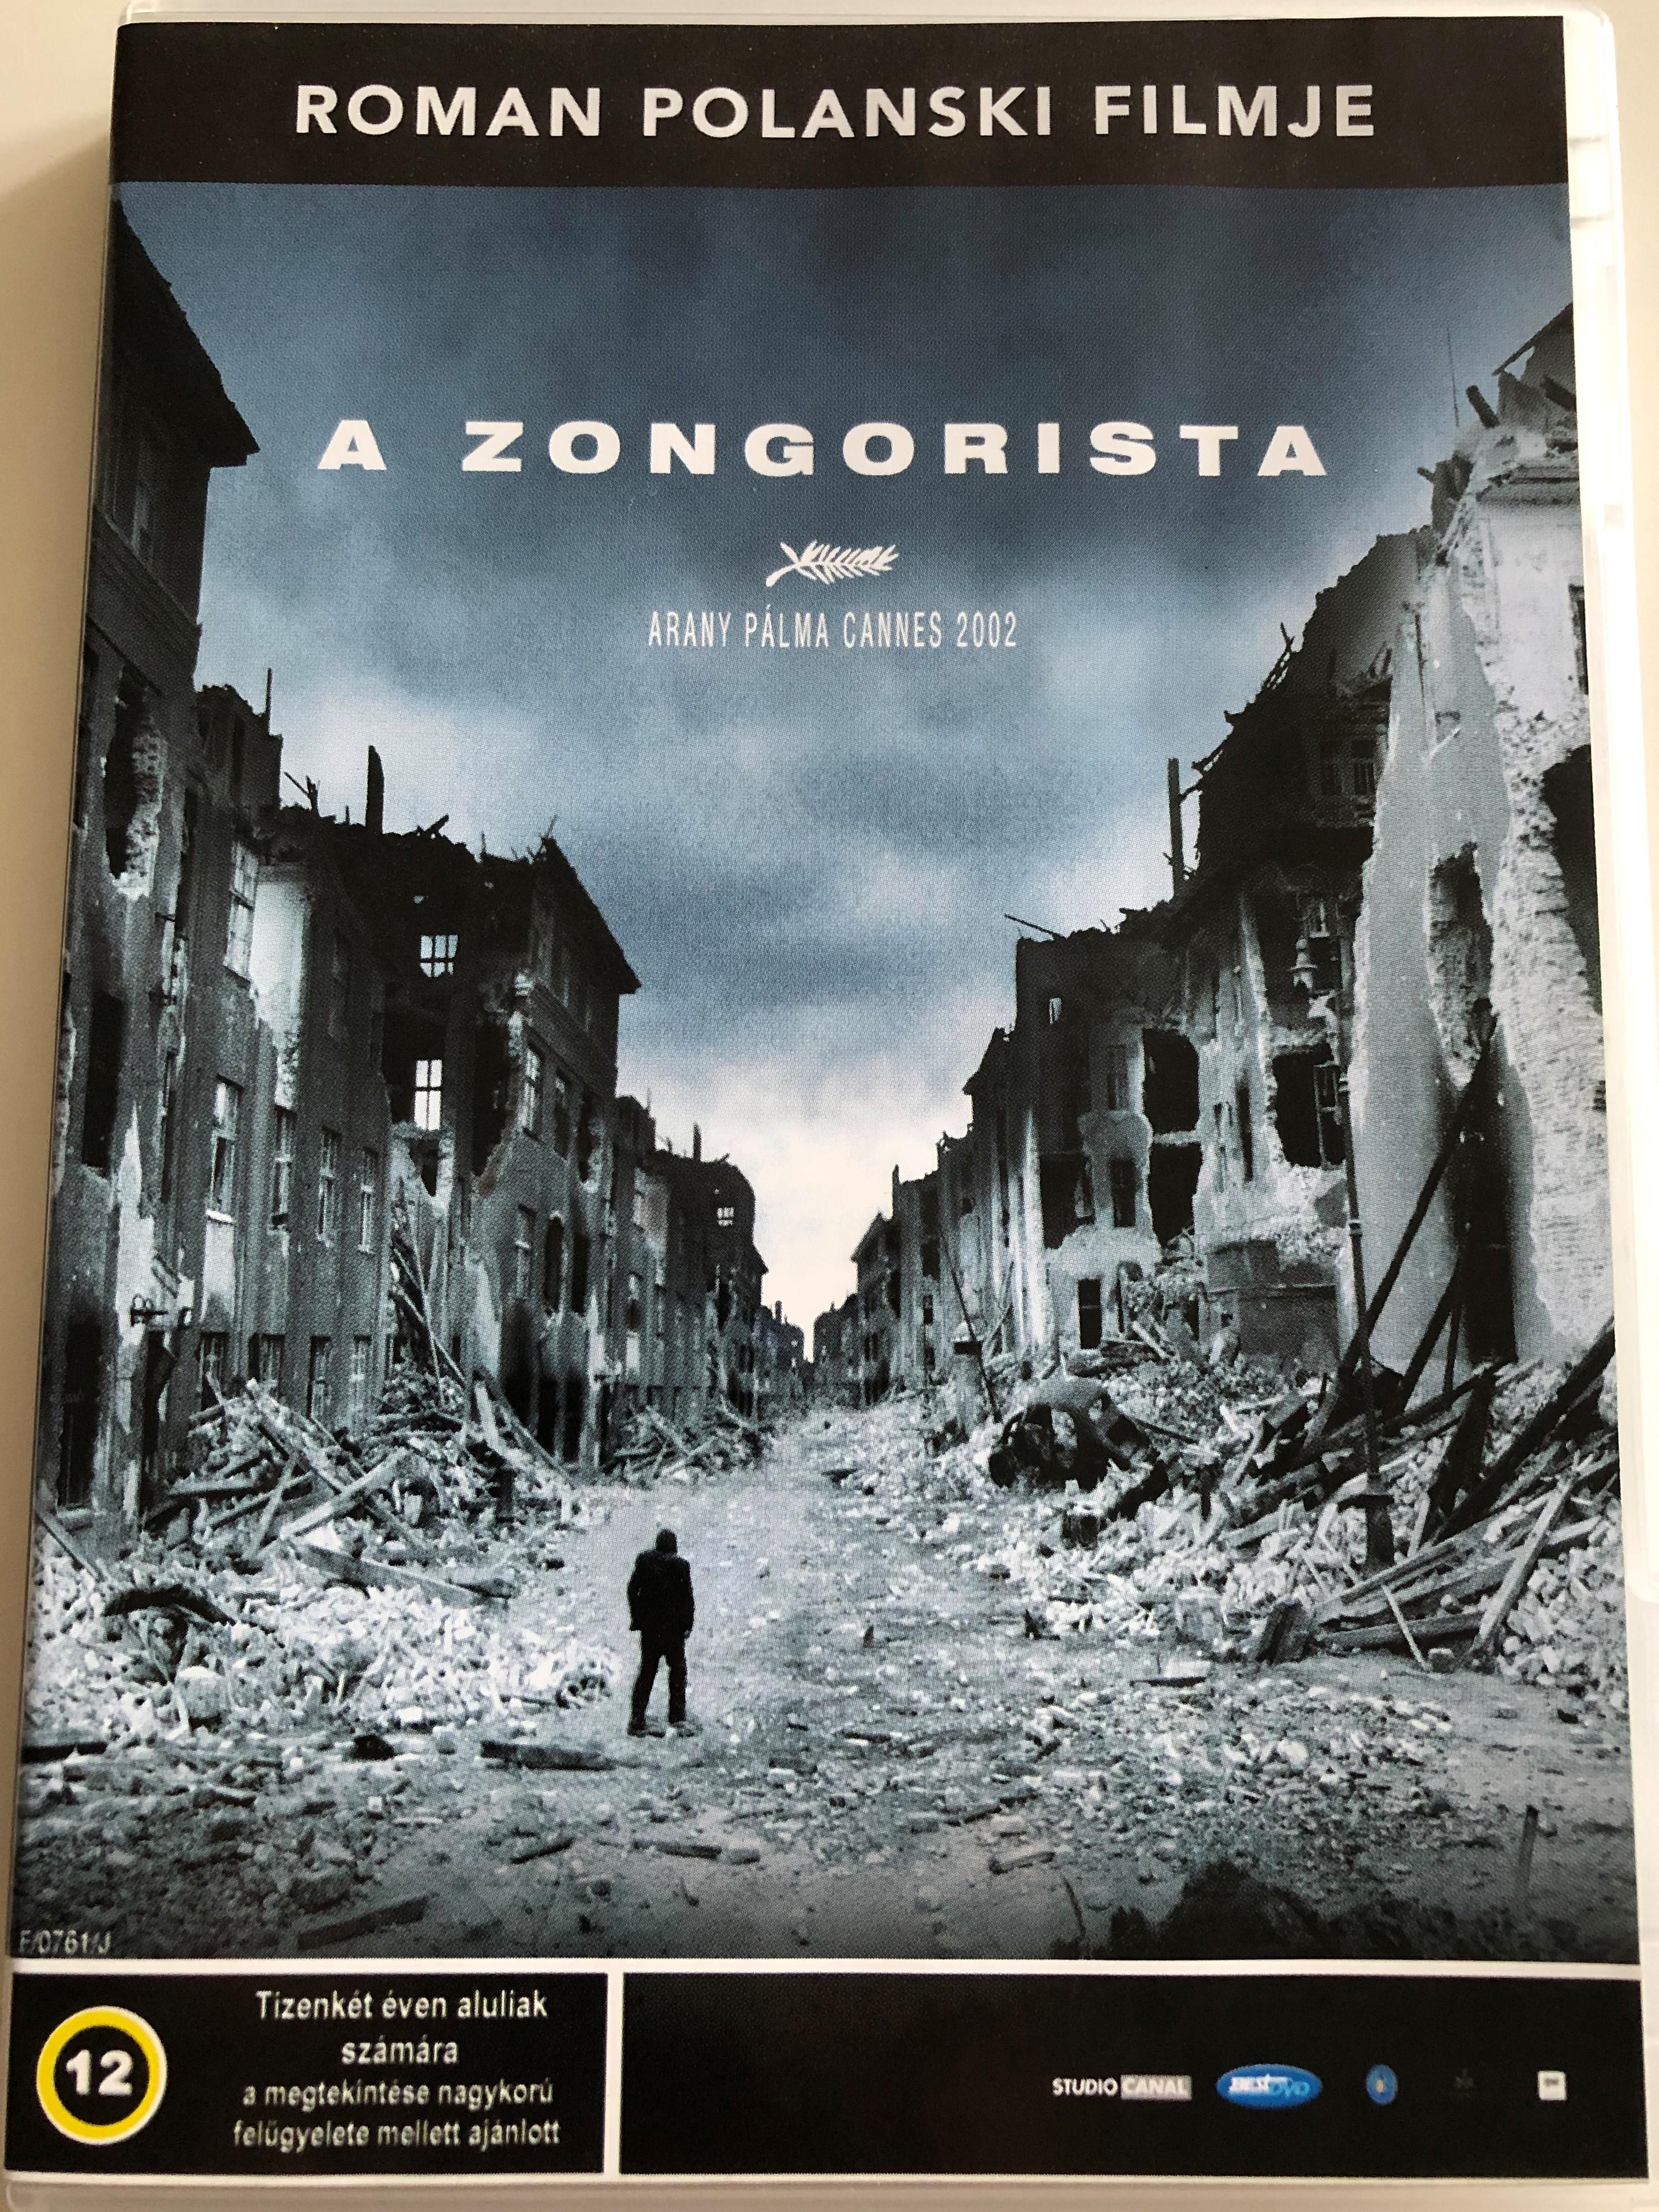 the-pianist-2002-a-zongorista-directed-by-roman-polanski-starring-adrien-brody-thomas-kretschmann-frank-finlay-maureen-lipman-emilia-fox-micha-ebrowski-based-on-the-pianist-by-w-adys-aw-szpilman-1-.jpg